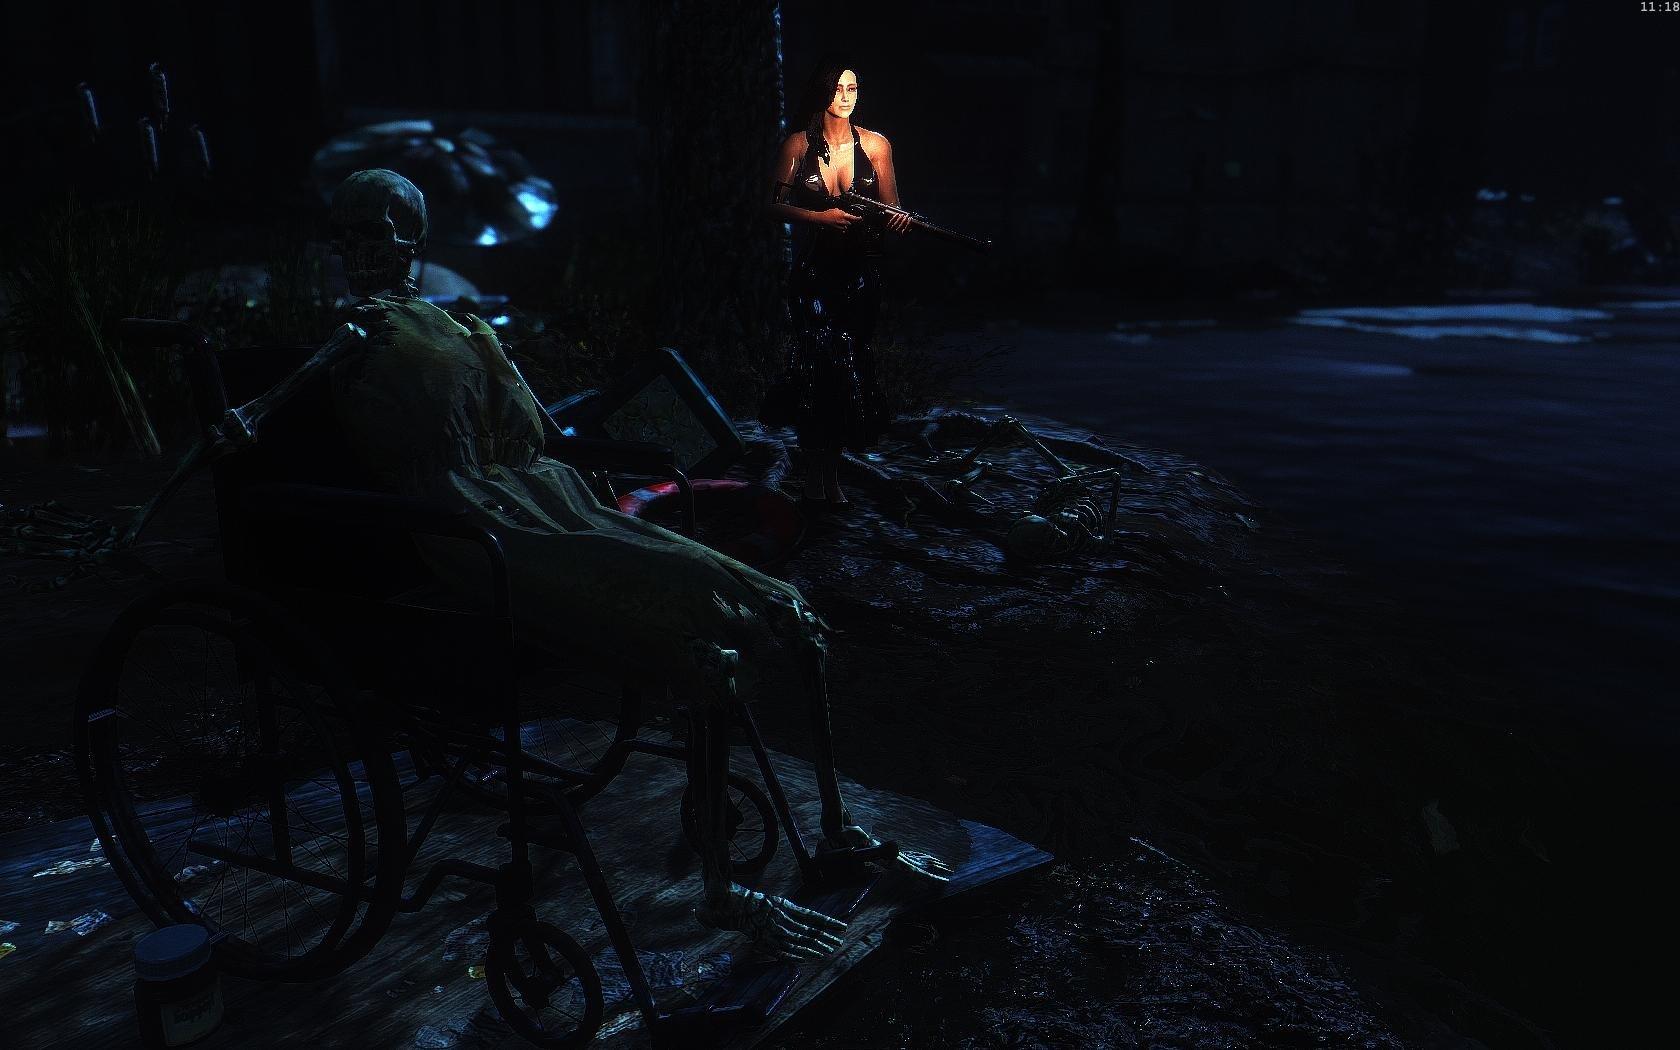 Fallout4 2019-02-12 11-18-03-09